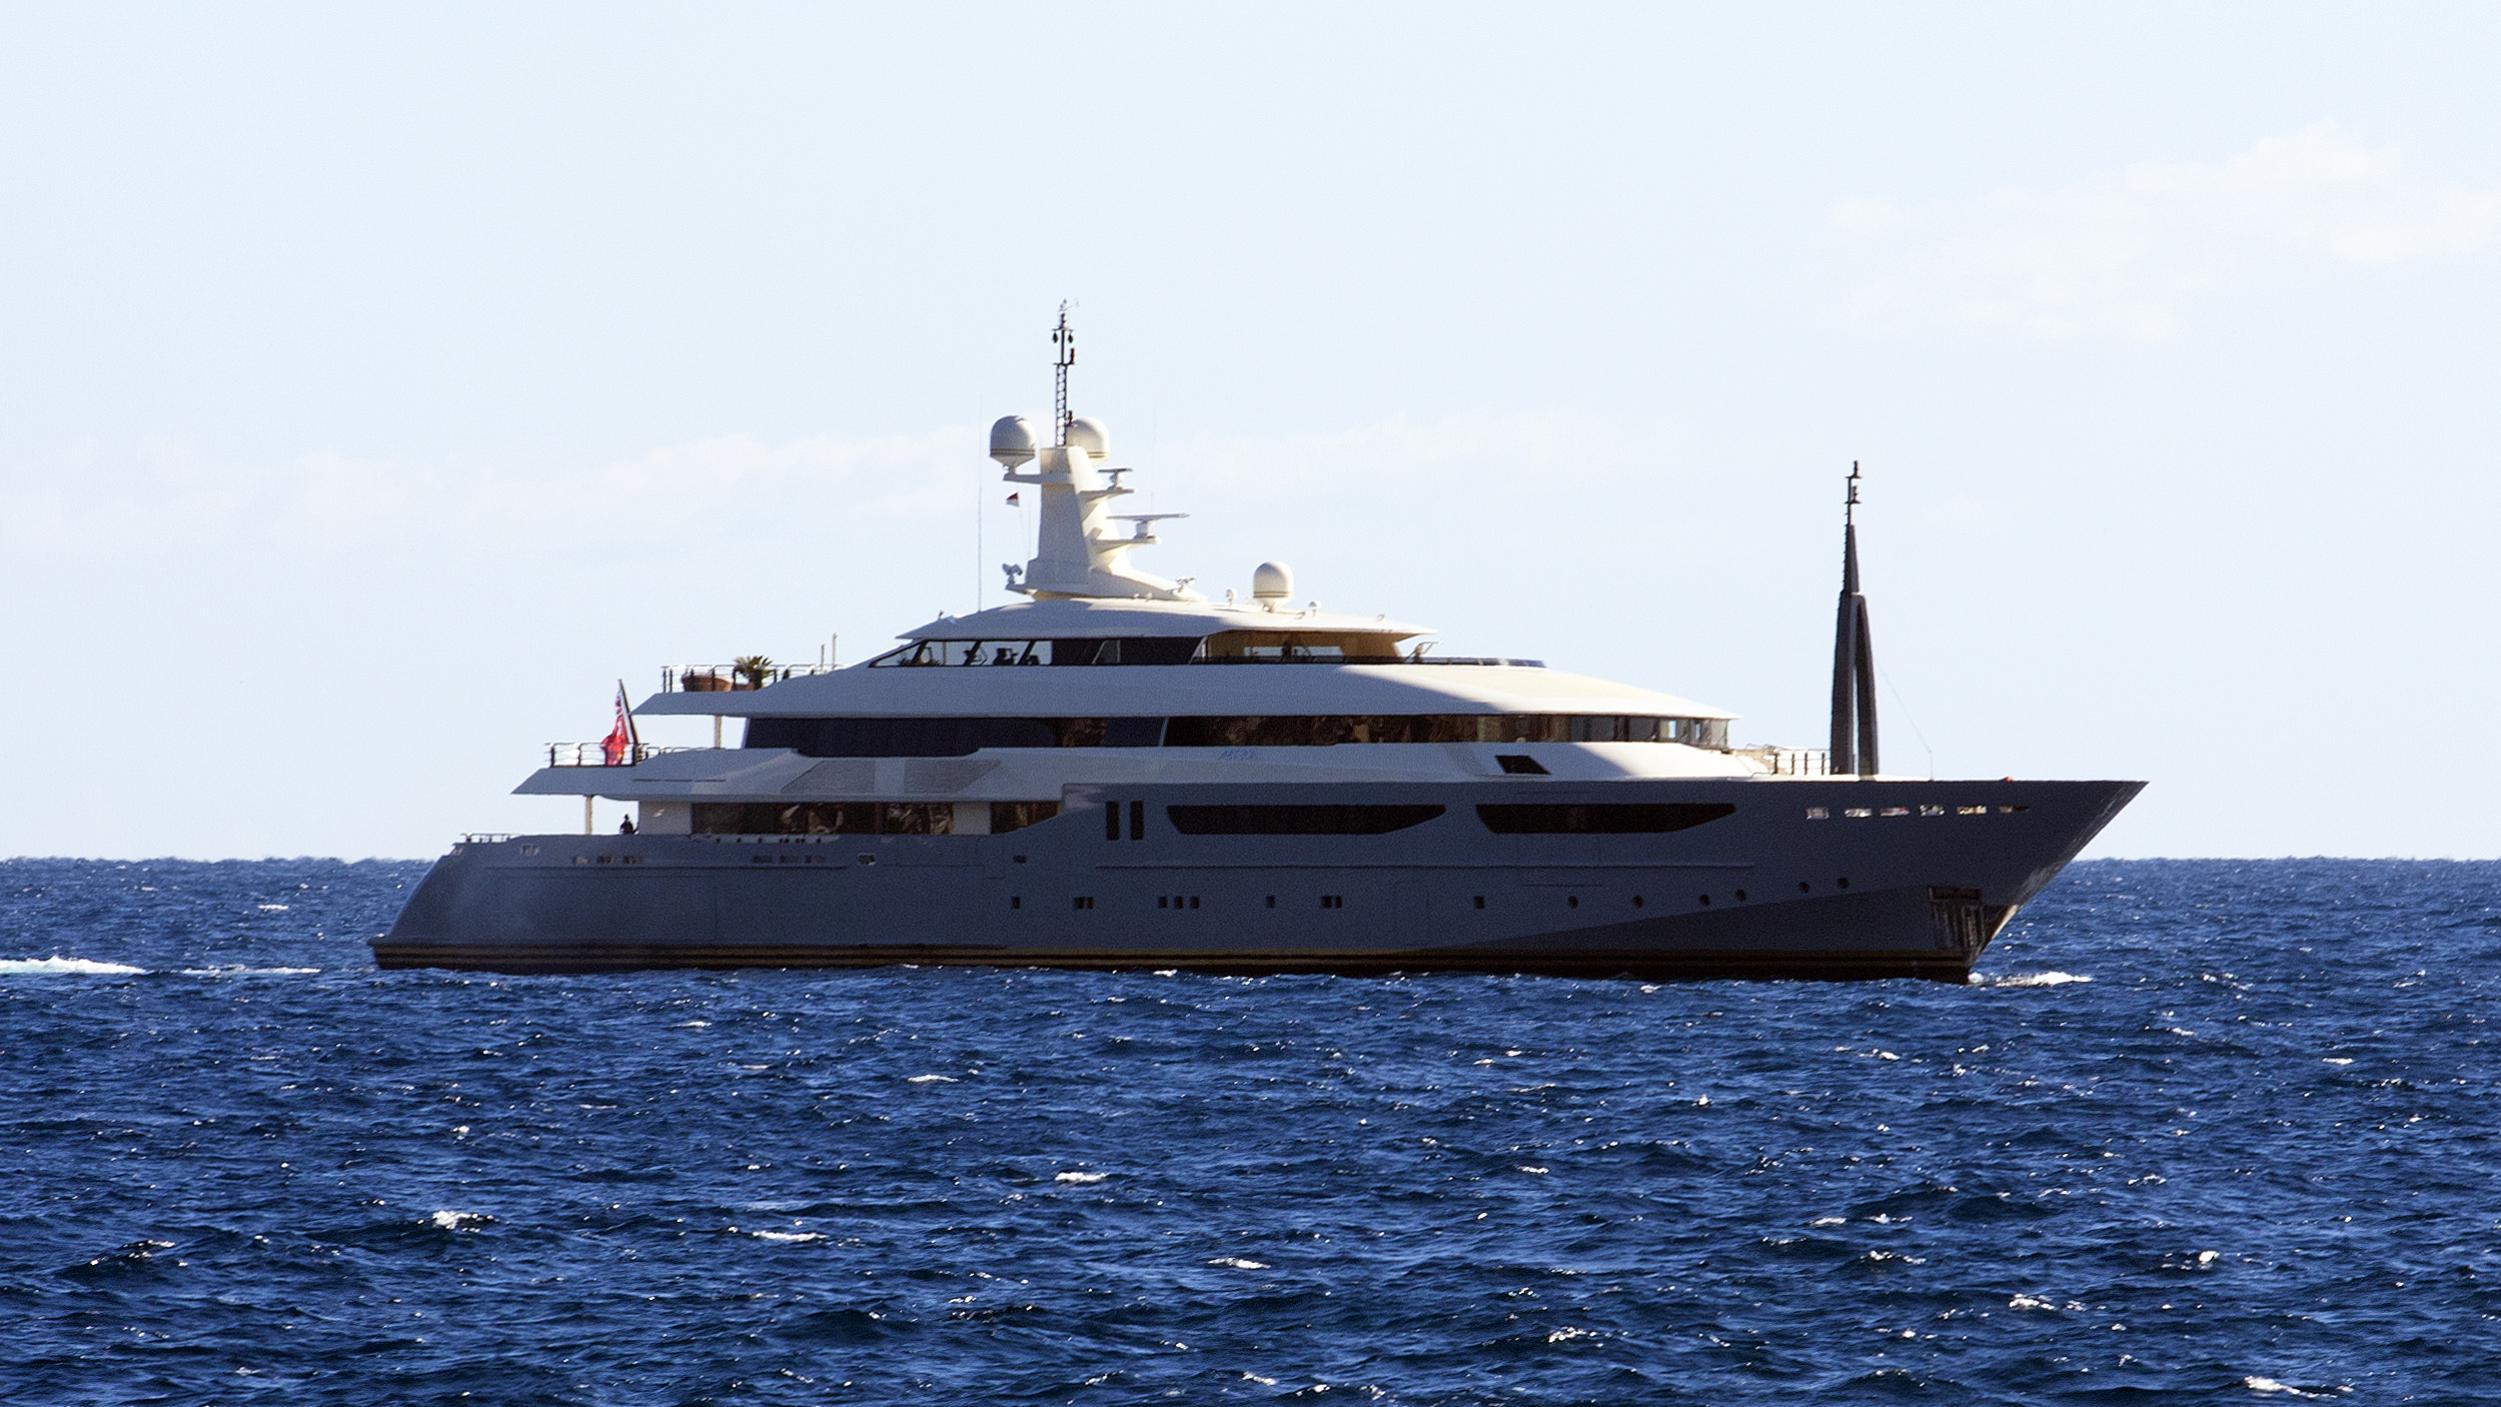 azteca-motor-yacht-crn-2009-72m-profile